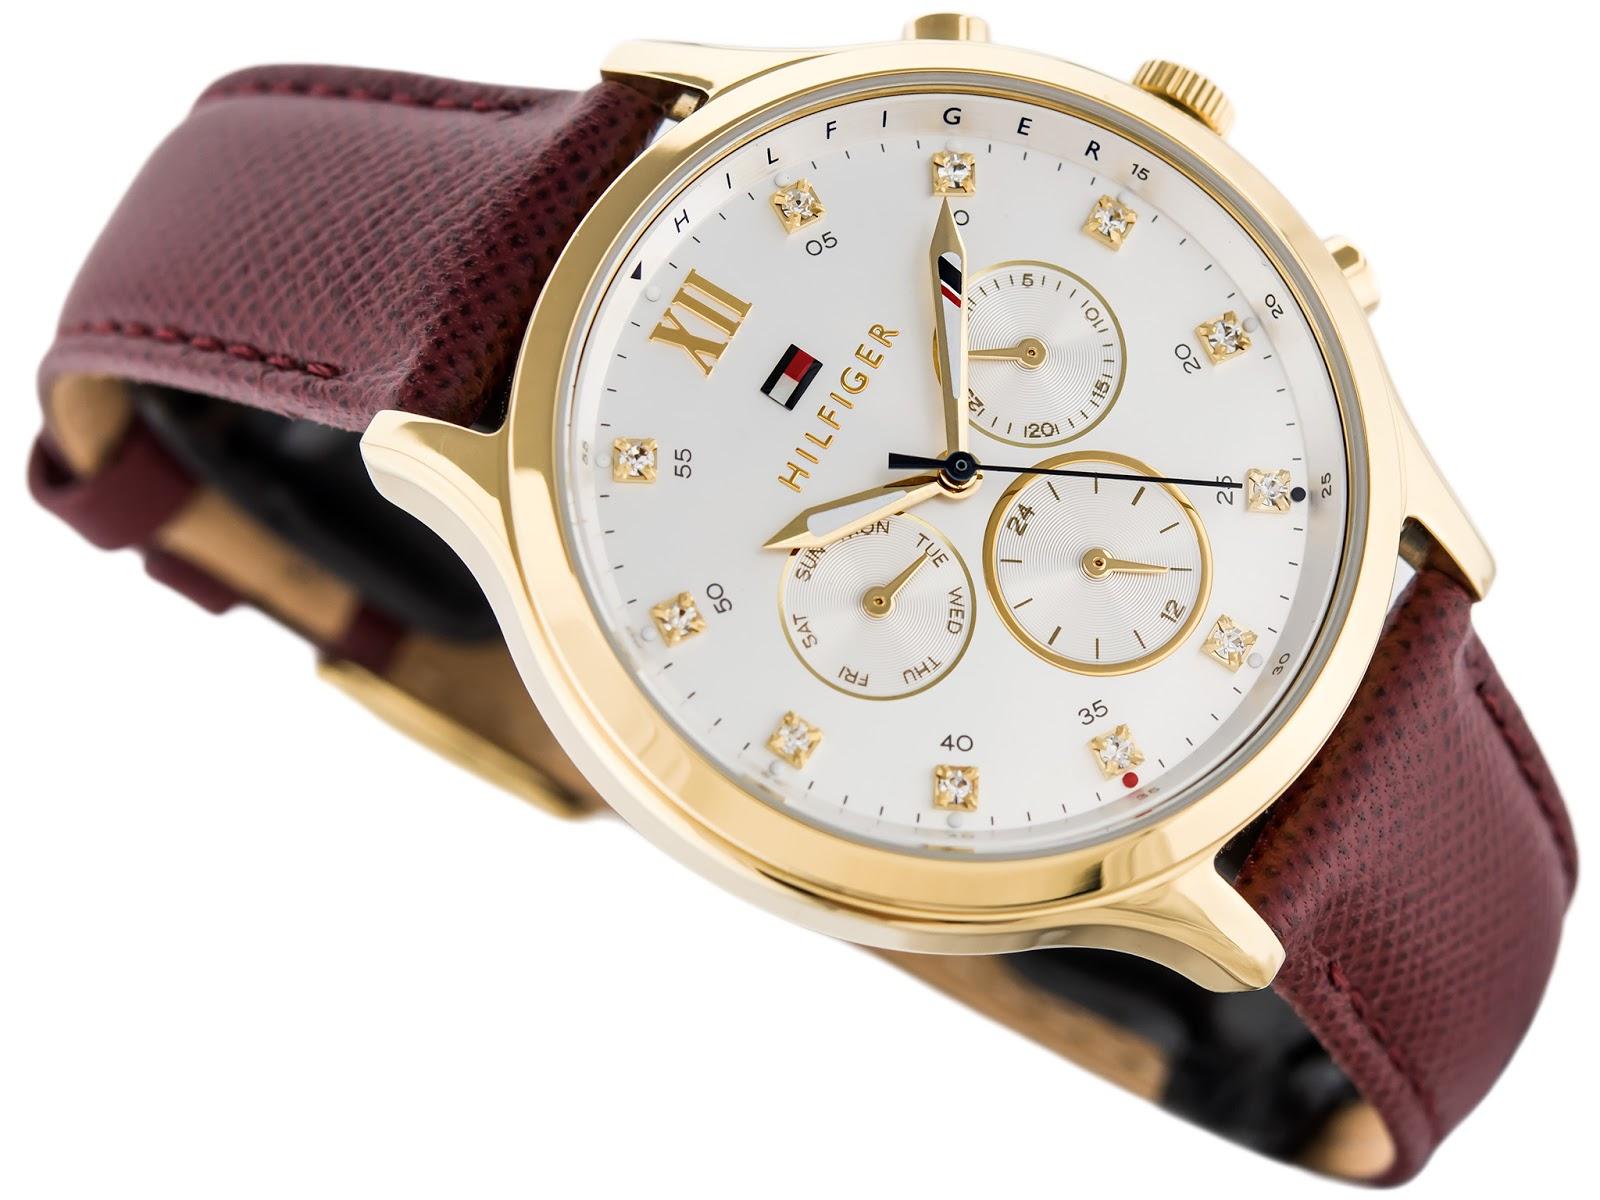 80fc2983f50 Relógio Tommy Hilfiger Feminino Couro Vinho - 1781614 - R  354